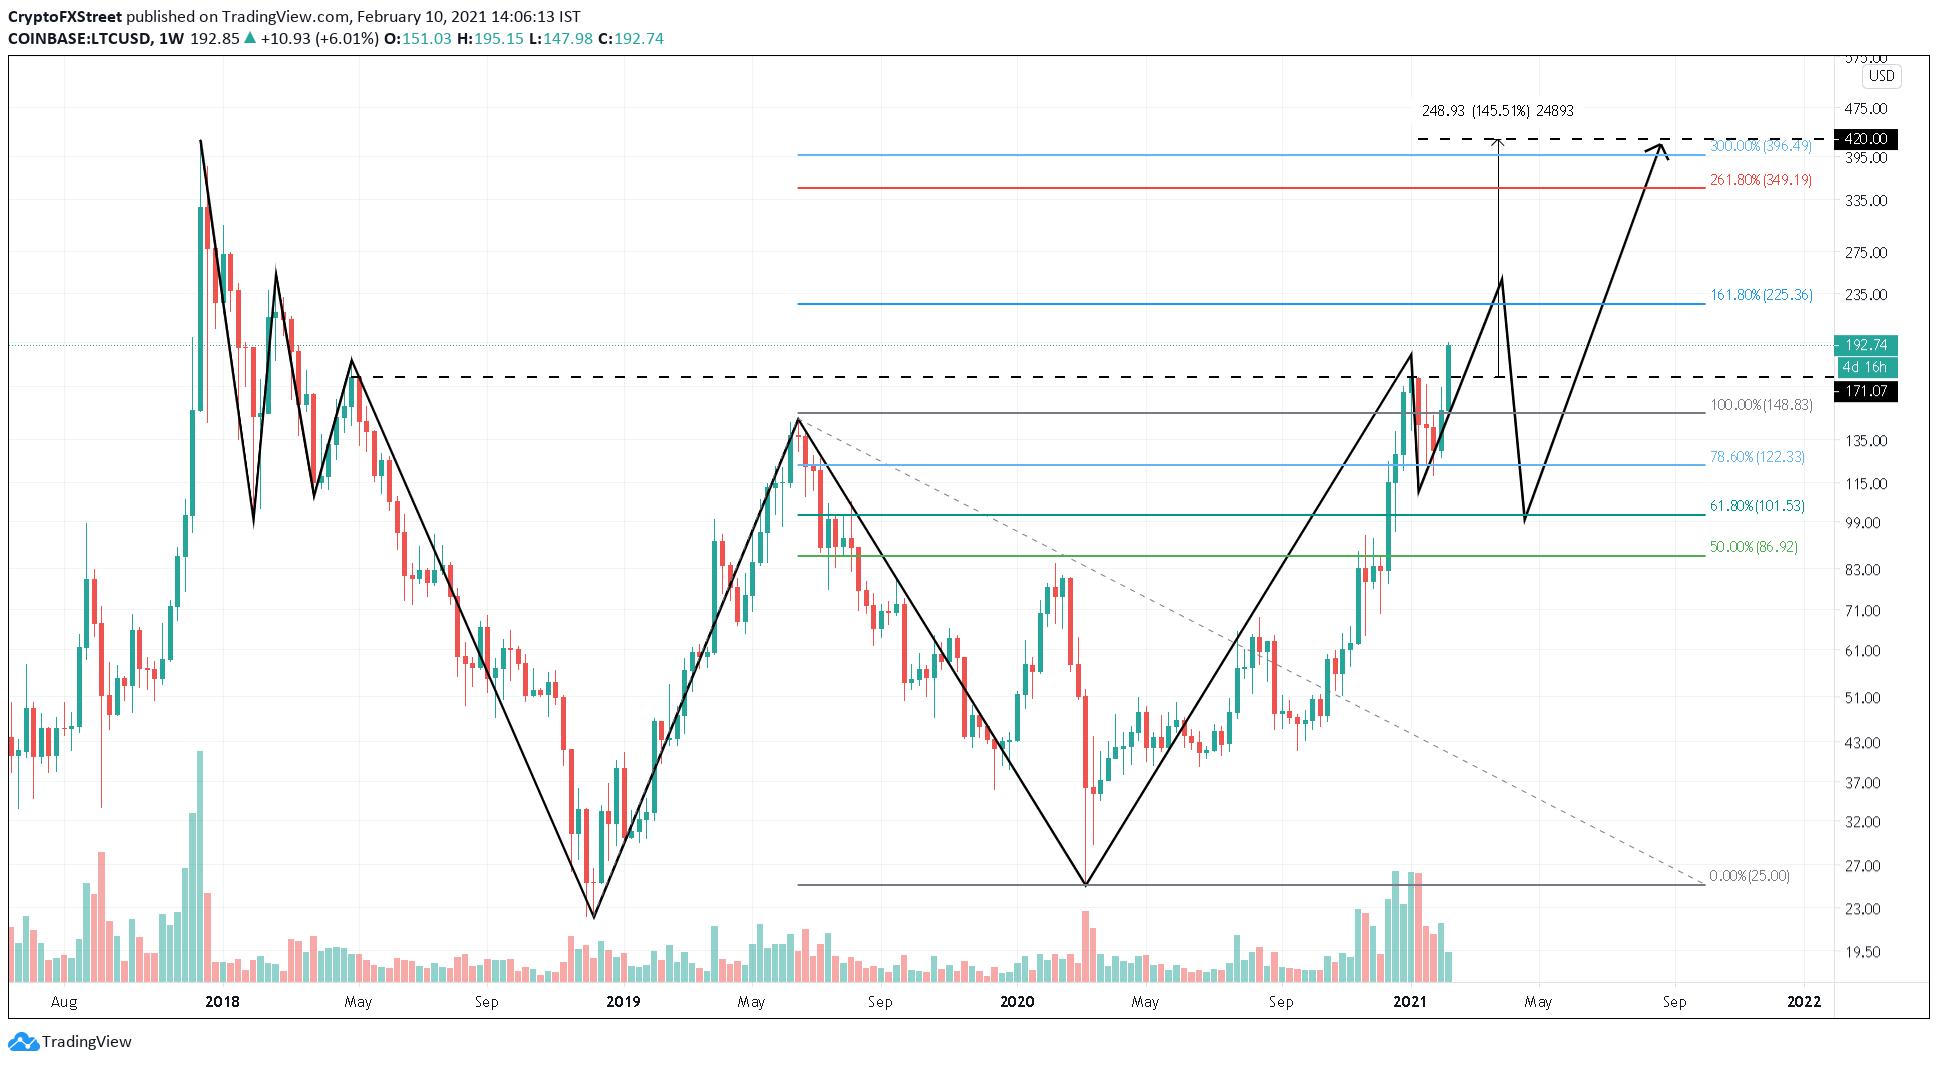 LTC/USD 1-week chart